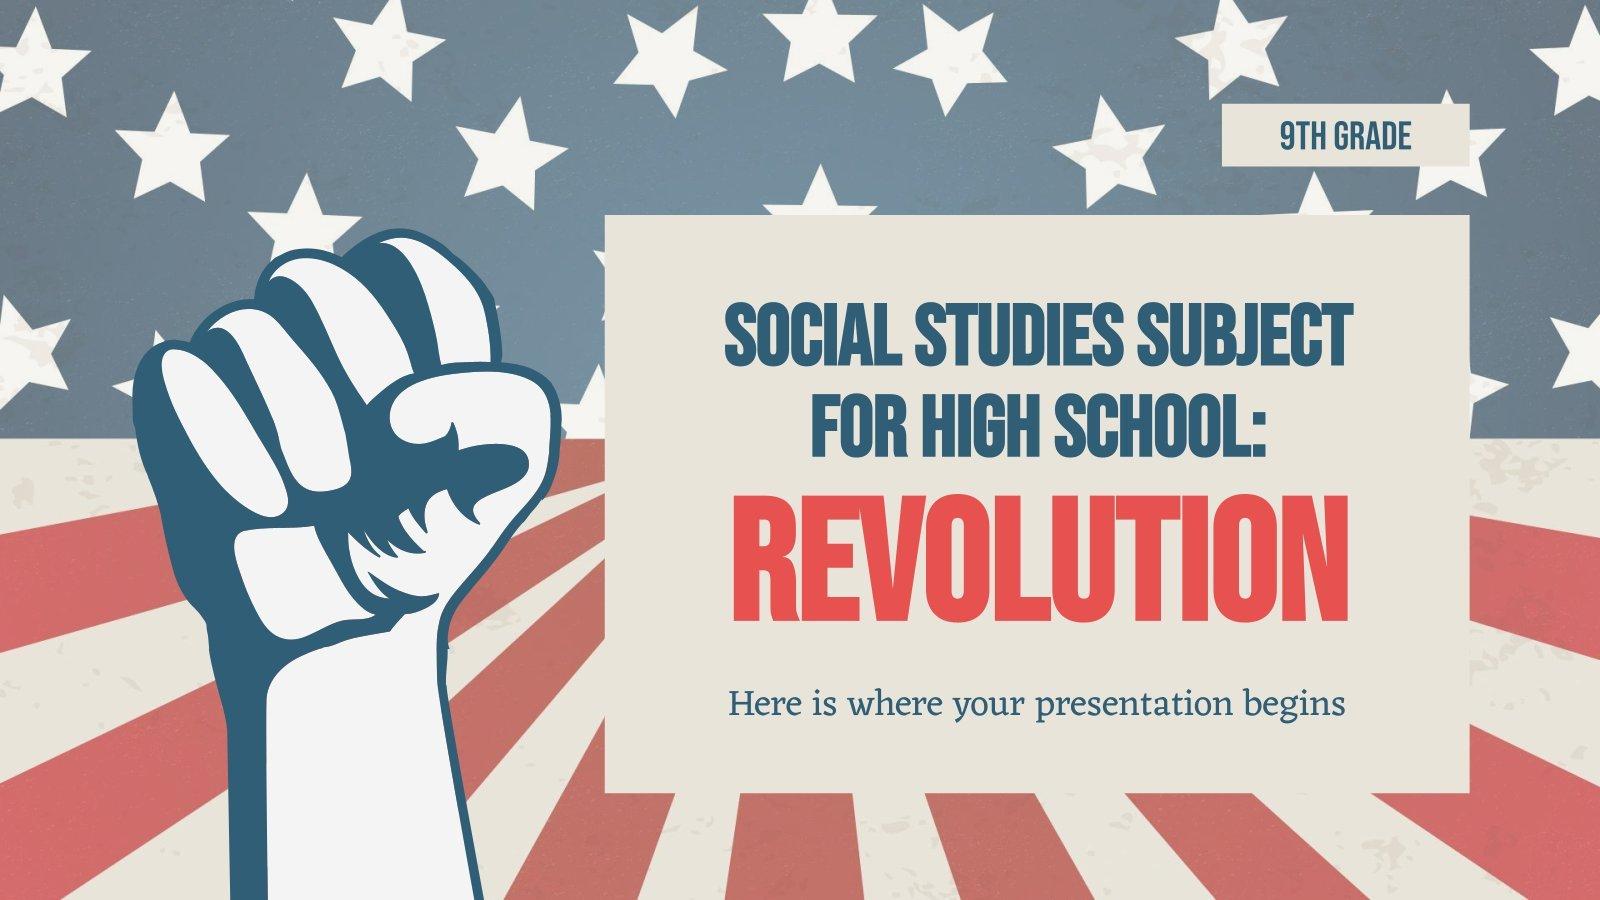 Social Studies Subject for High School - 9th Grade: Revolution presentation template